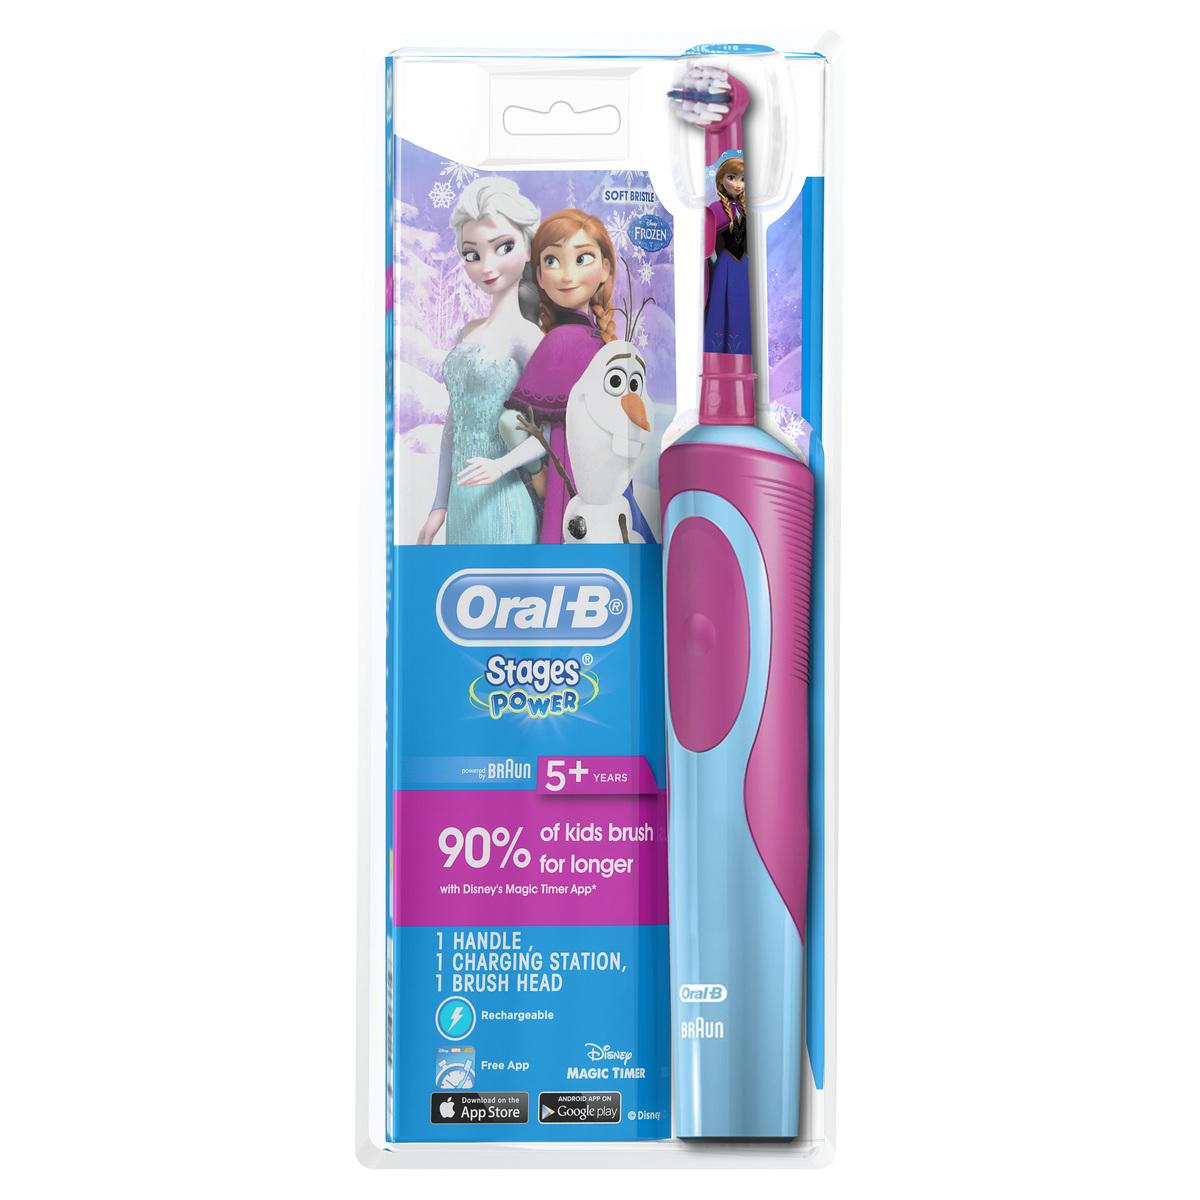 Frozen限量版 Stage Power 迪士尼兒童電動牙刷 D12K